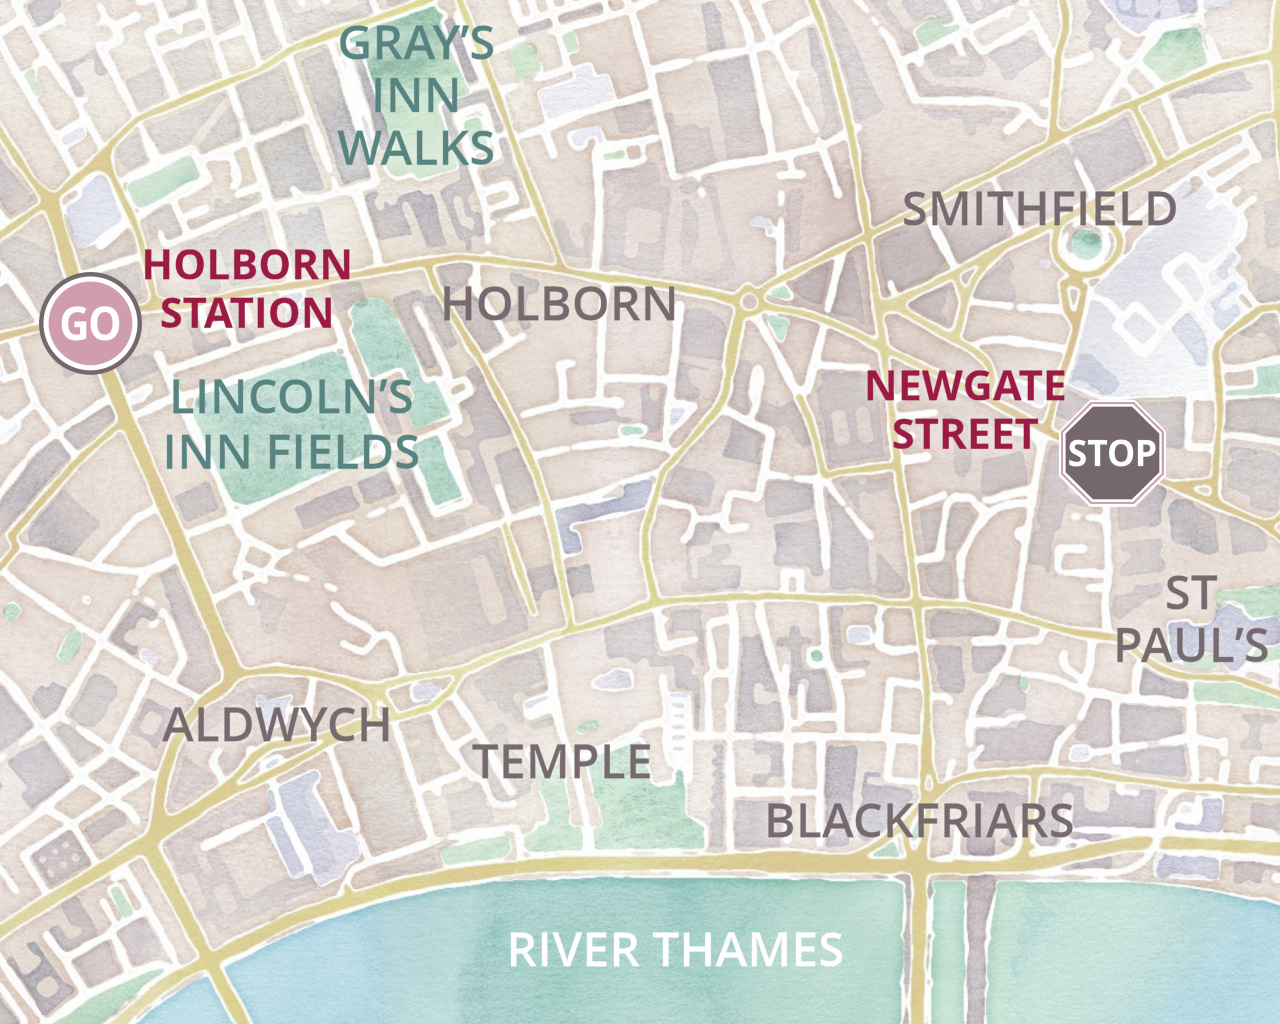 My London Walks - Holborn area map